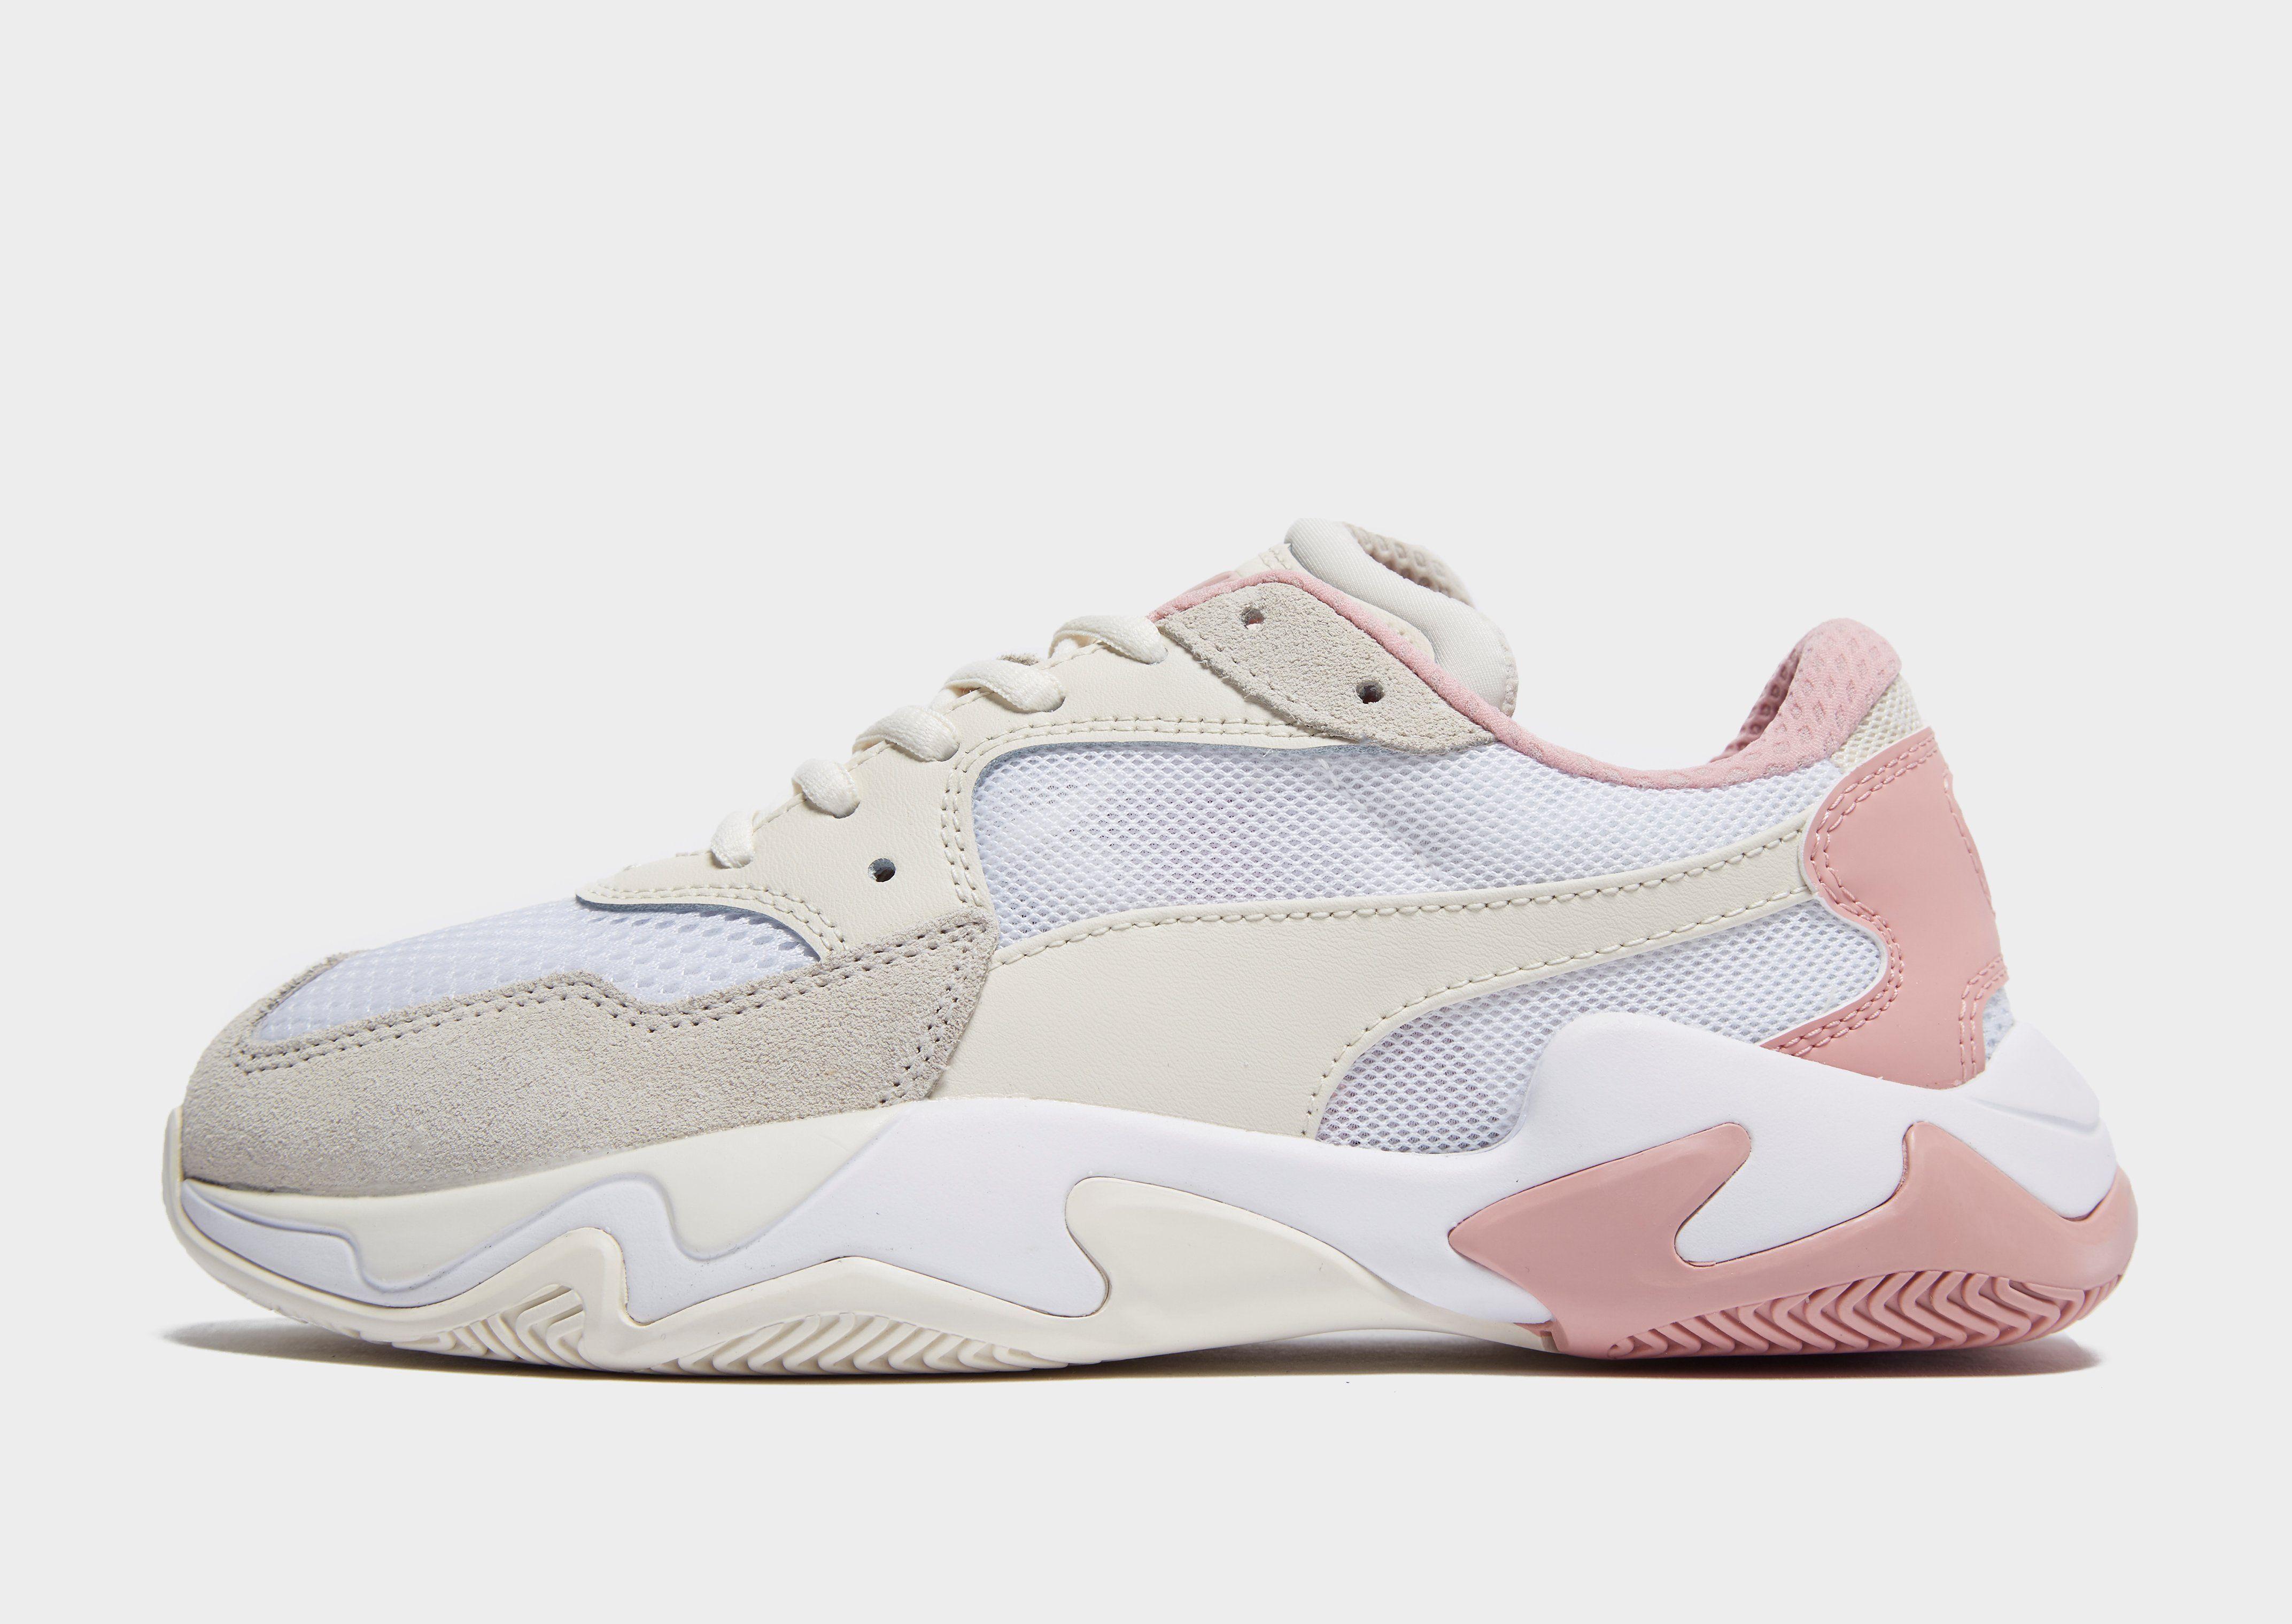 4f147515 puma storm origin wit dames shoes in 2019 schoenen ...